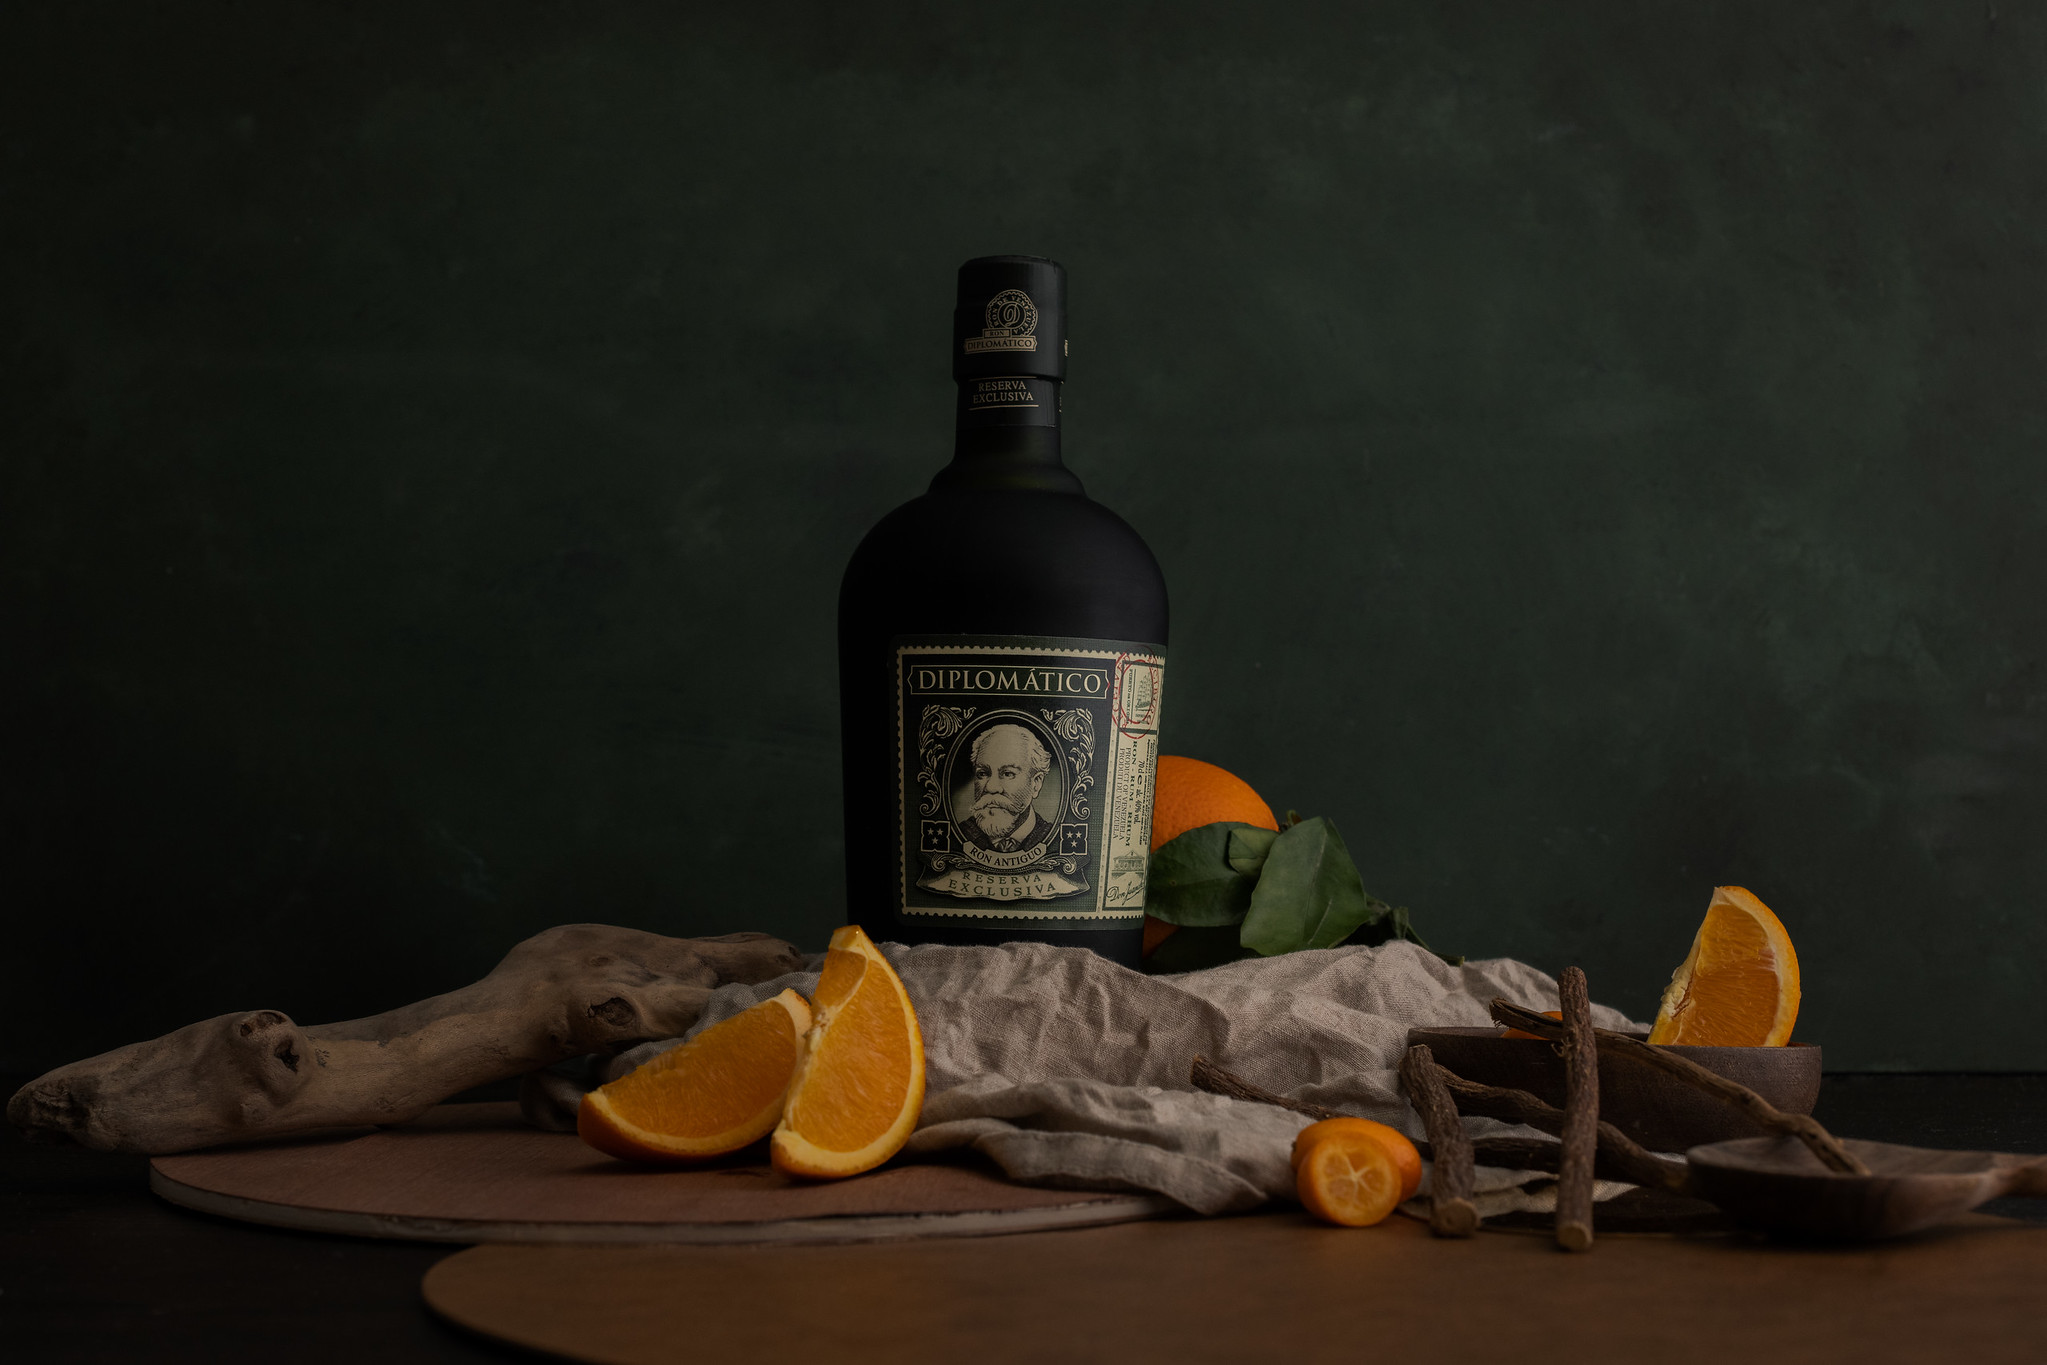 fotografo-Bebidas-Lifestyle-publicitario-ron-diplomatico-jose-salto